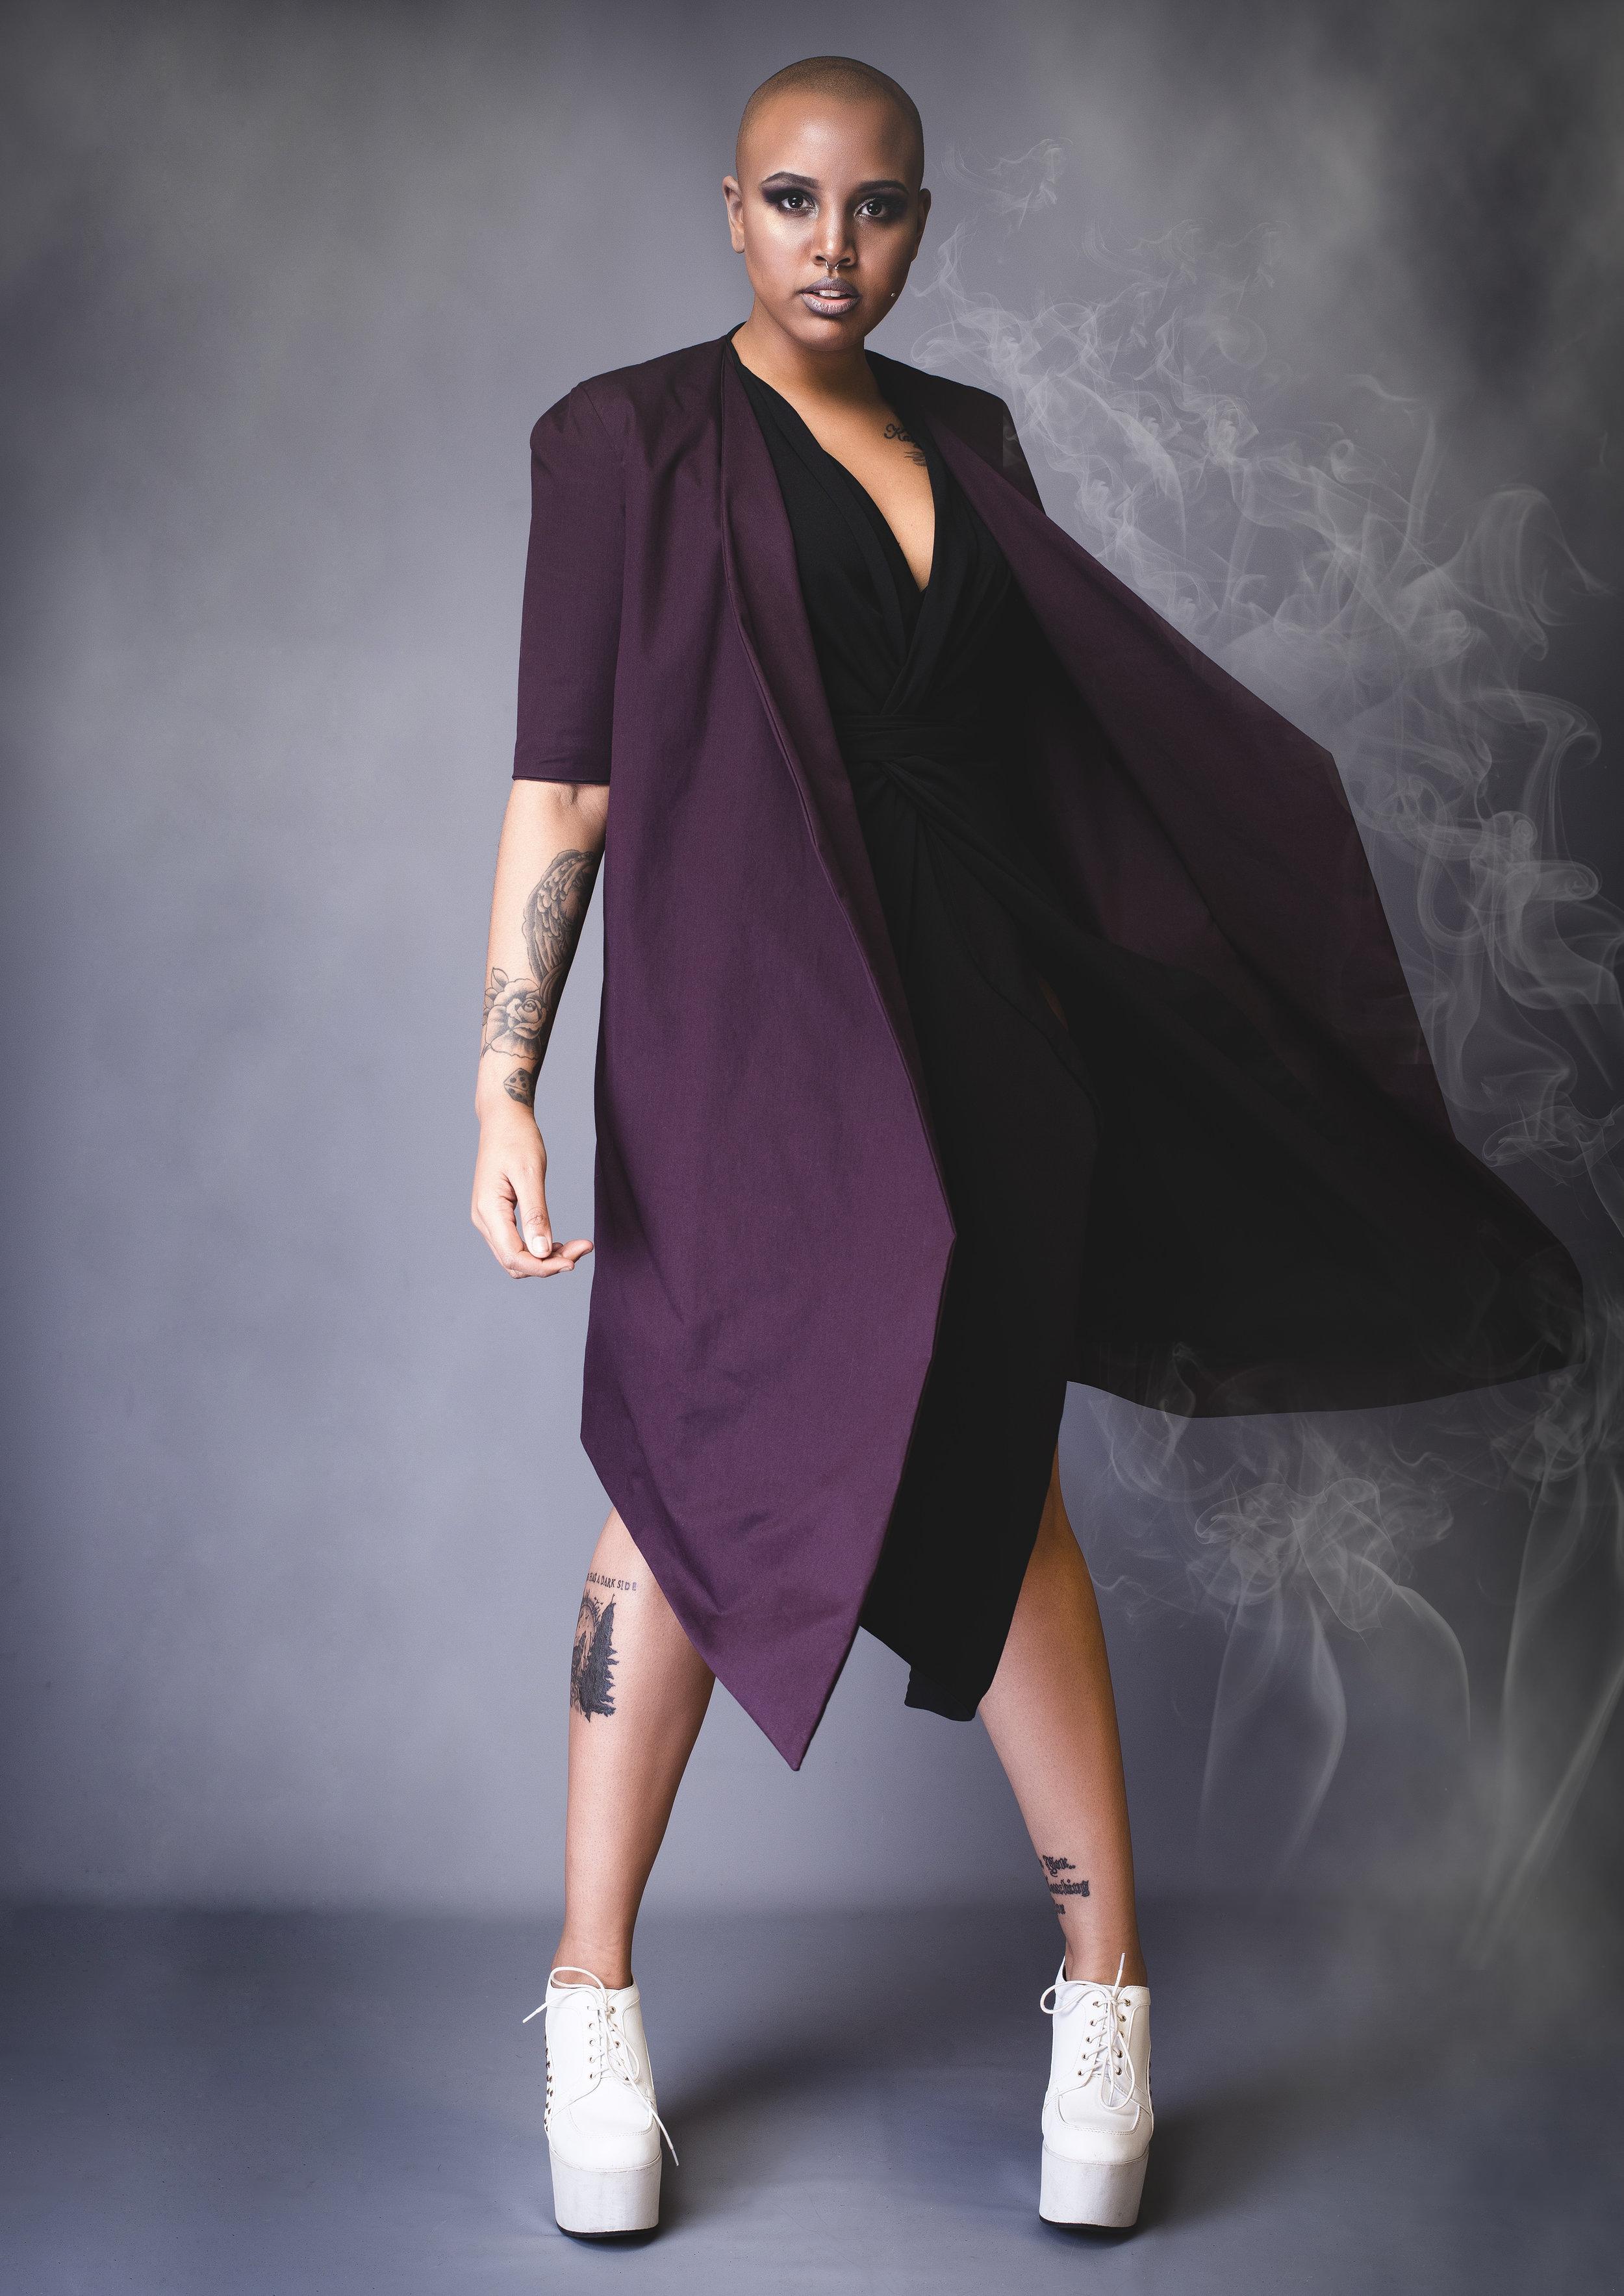 zaramia-ava-zaramiaava-leeds-fashion-designer-leedsfashiondesigner-stylist-leeds-stylist-leedsstylist-ethical-sustainable-minimalist-versatile-drape-wrap-purple-cowl-ryo-emi-black-4